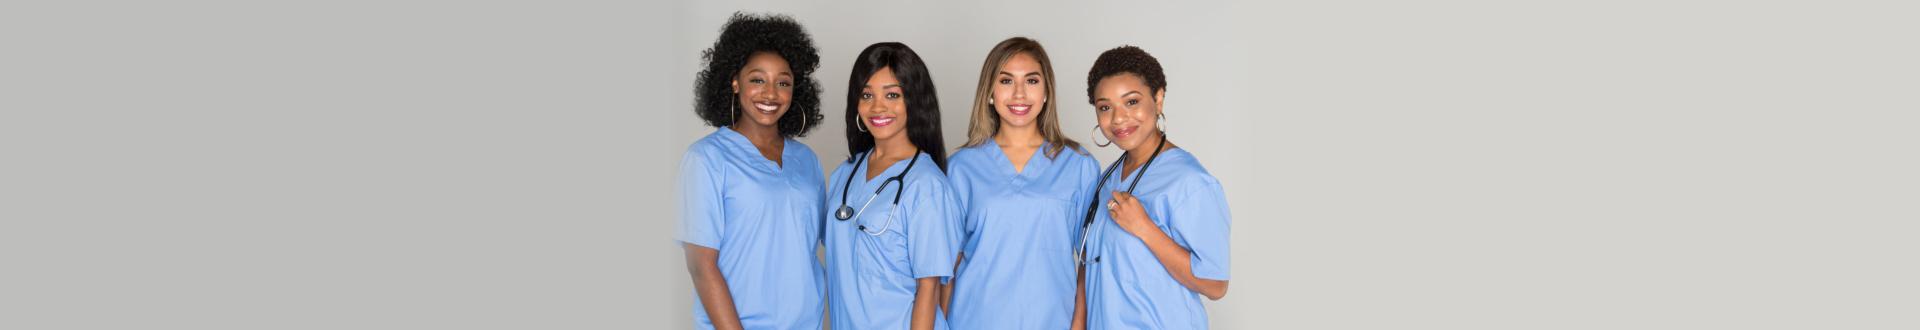 Large group of female nurses working together